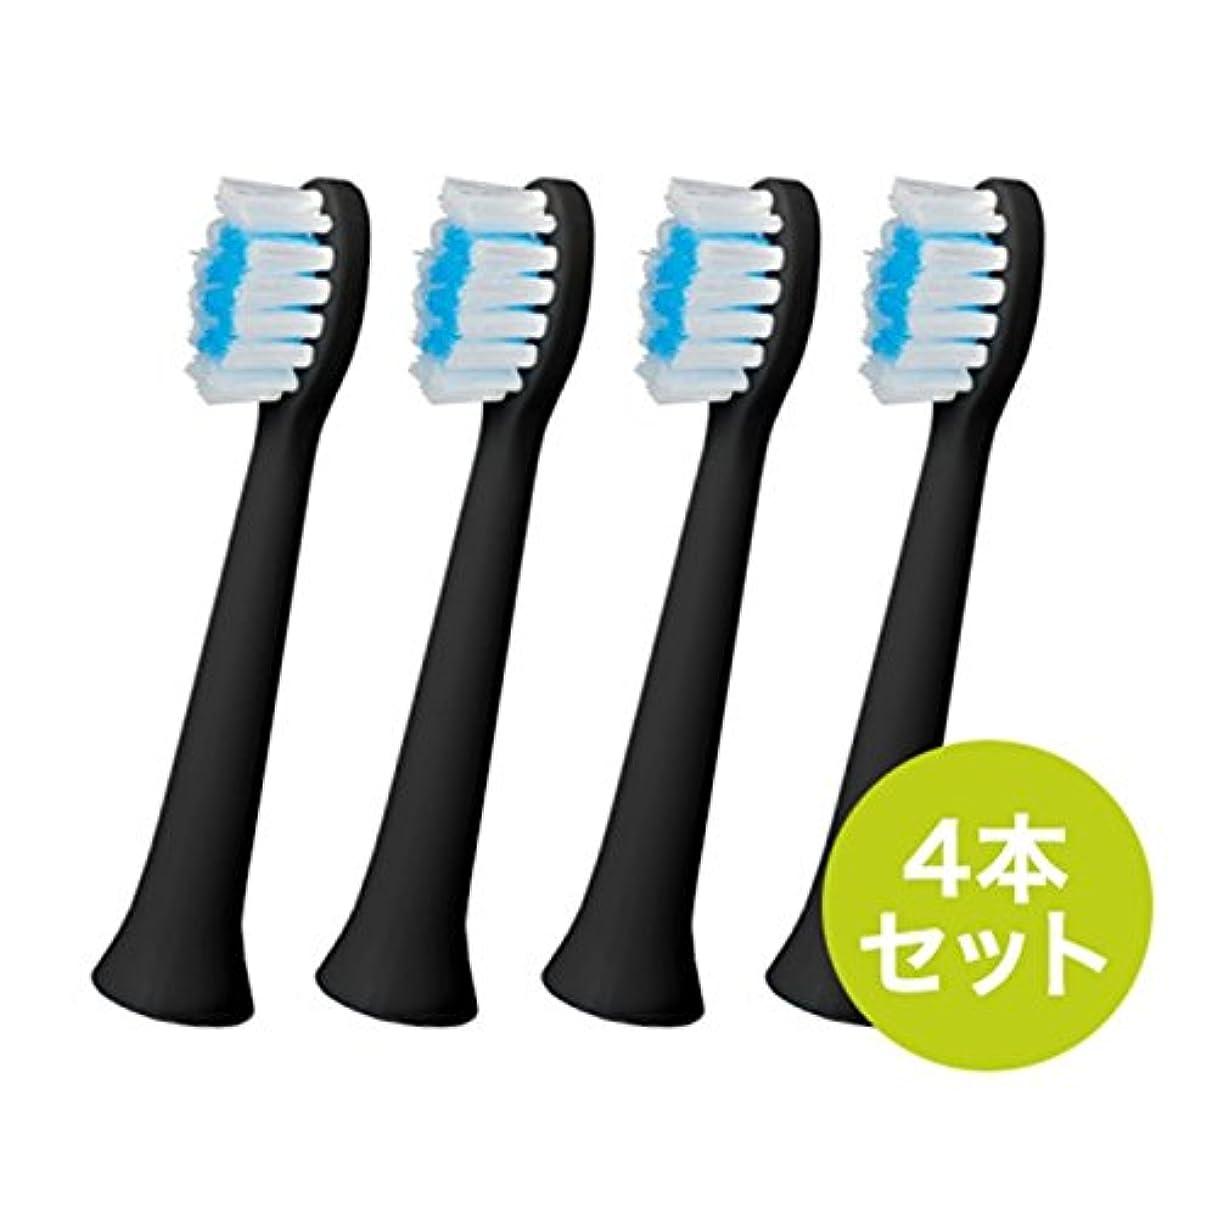 DOMO電動歯ブラシ(交換ブラシ4本セット黒)